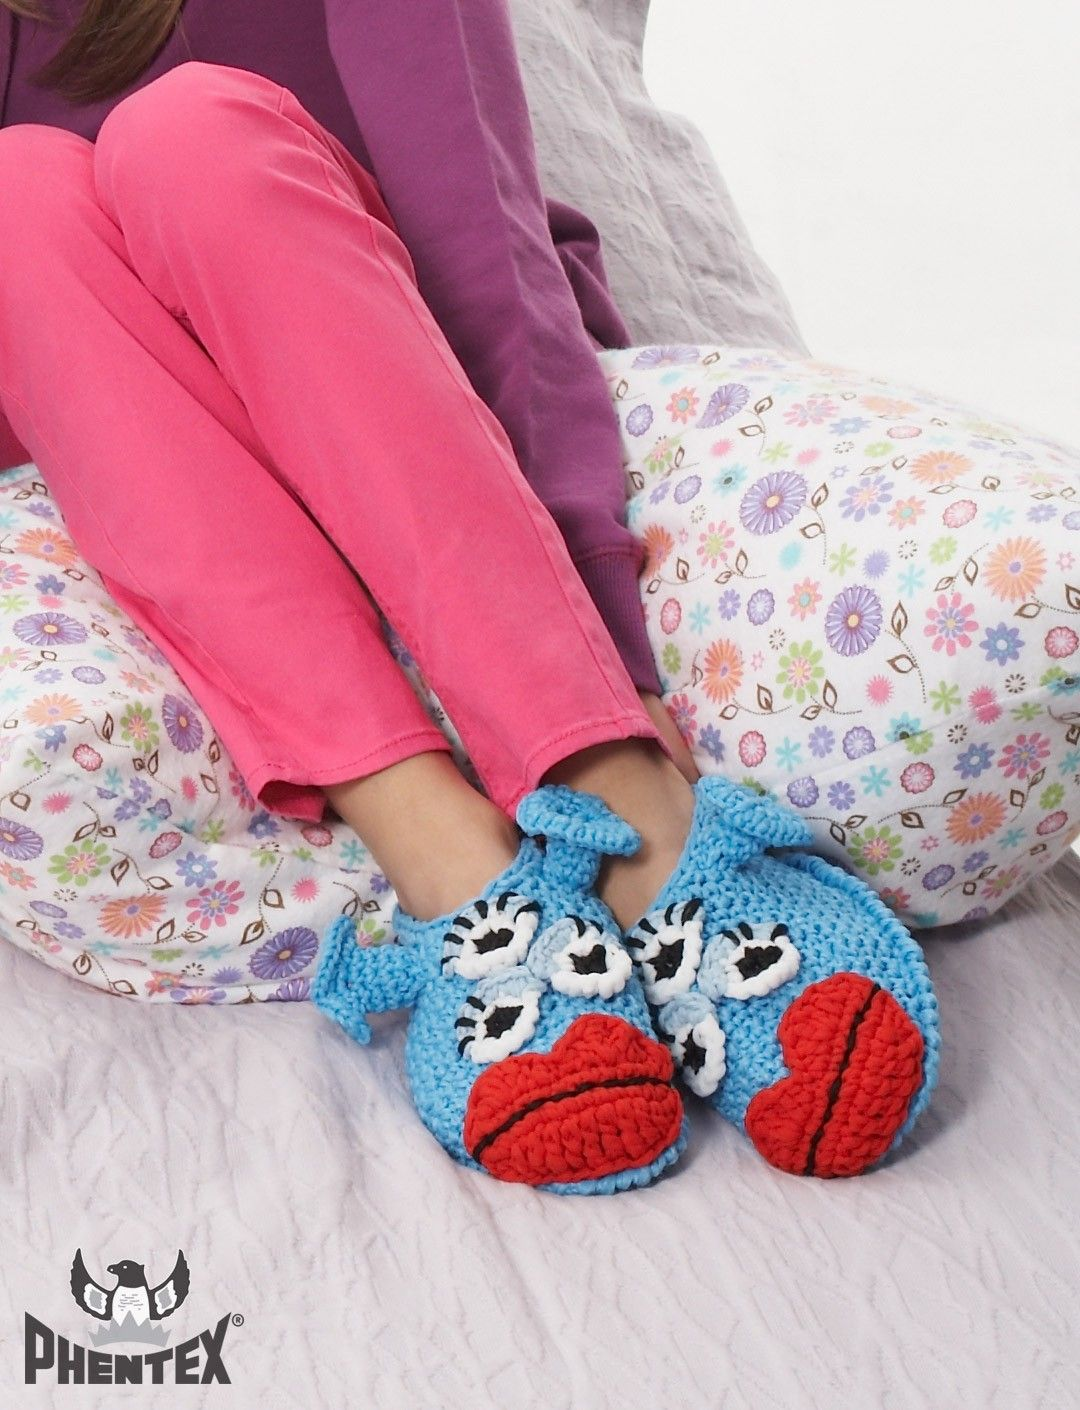 Blue Meanie Monster Slippers Free Crochet Pattern